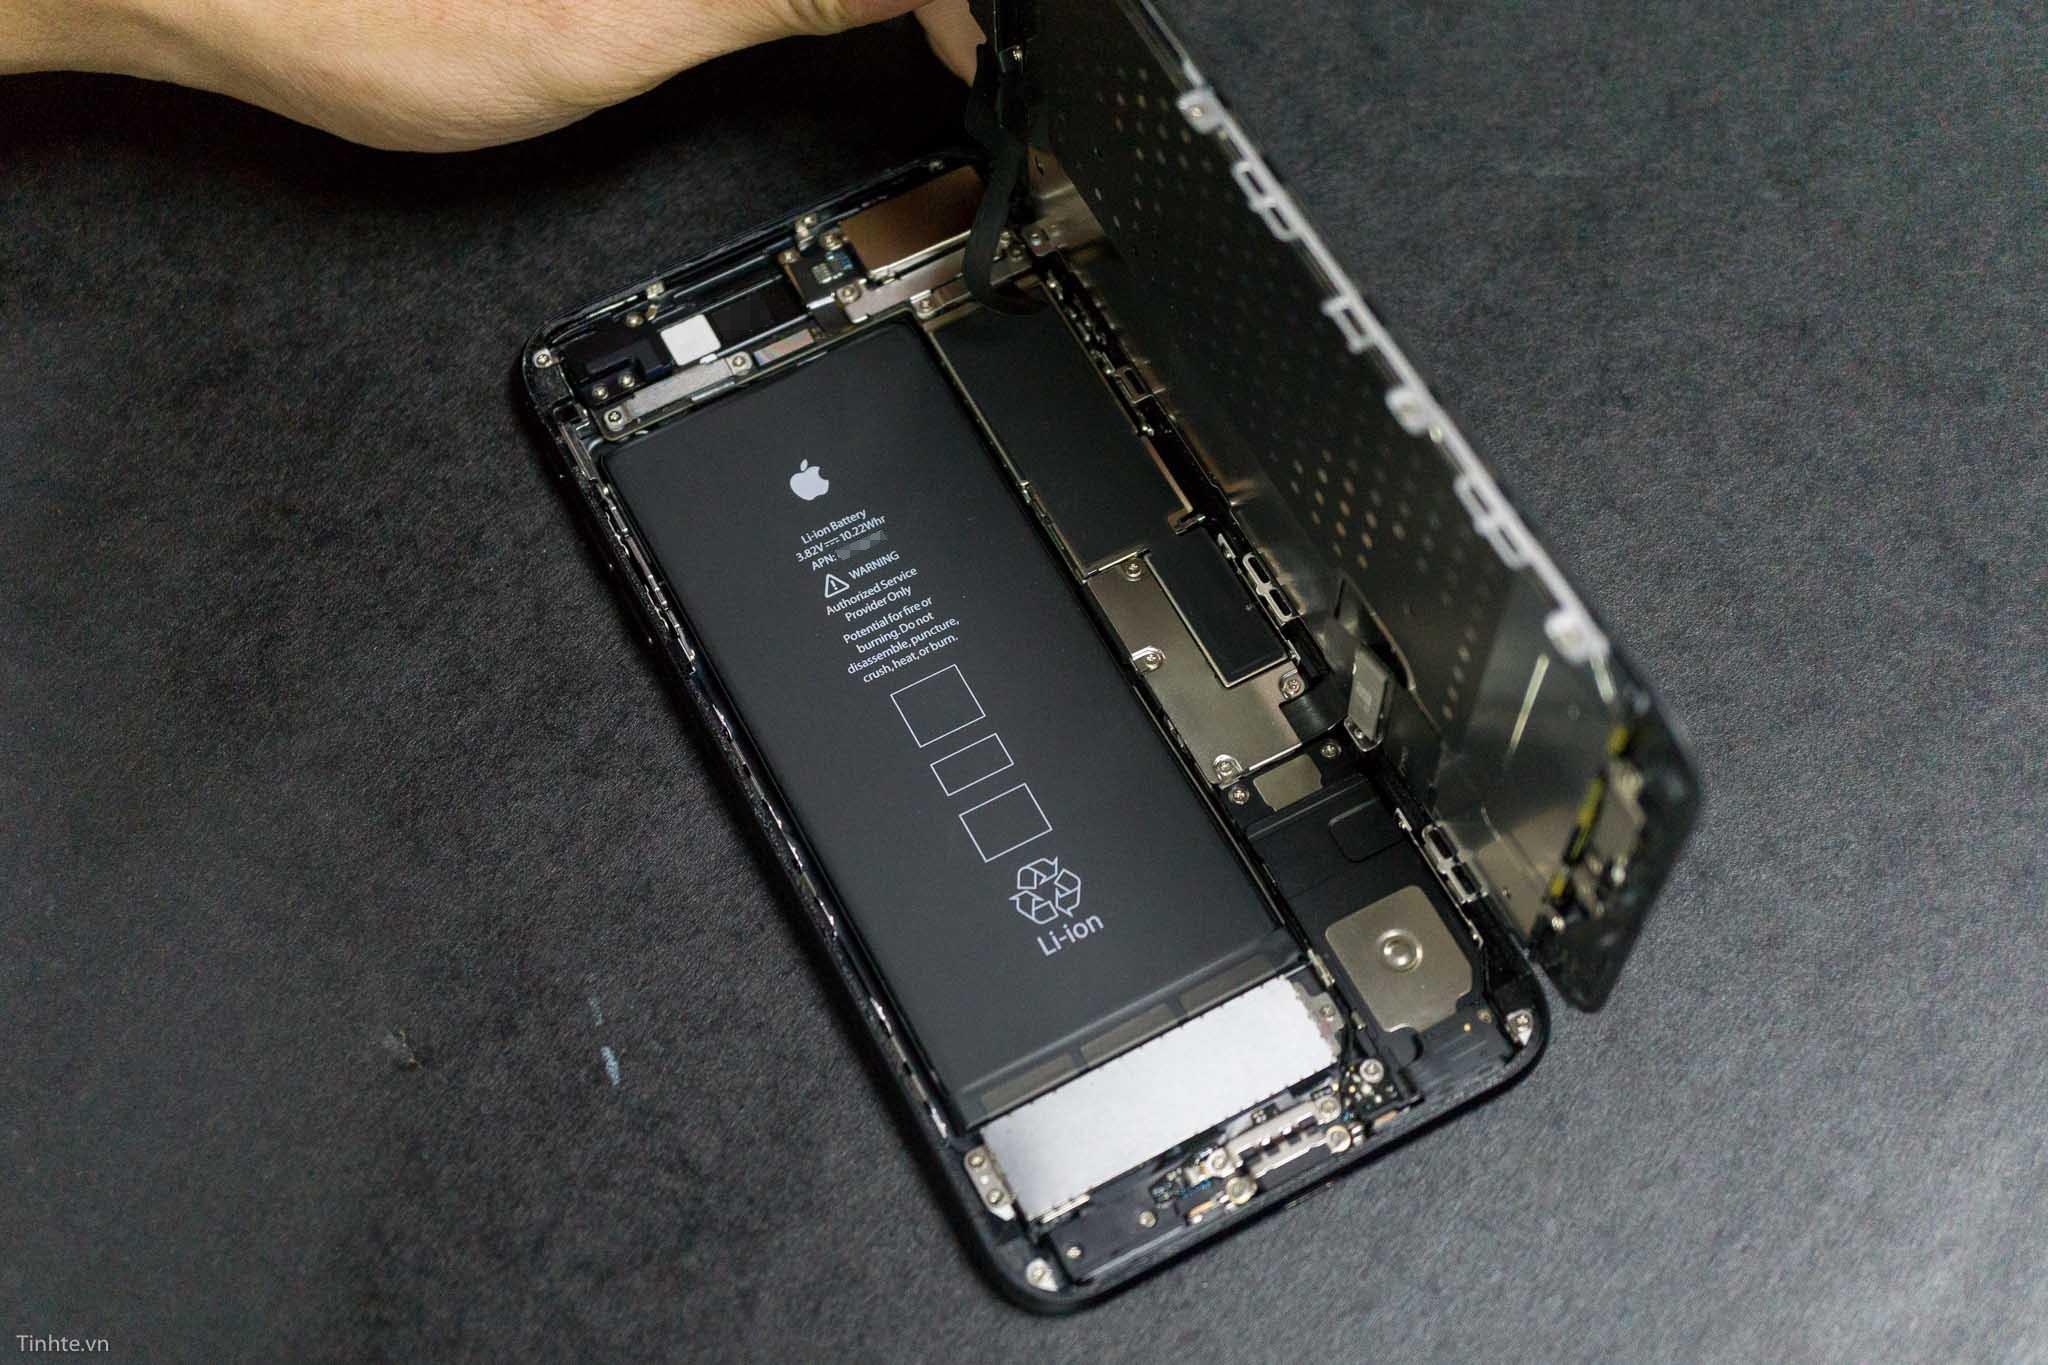 ben-trong-iphone-7-plus-tinhte-19.jpg